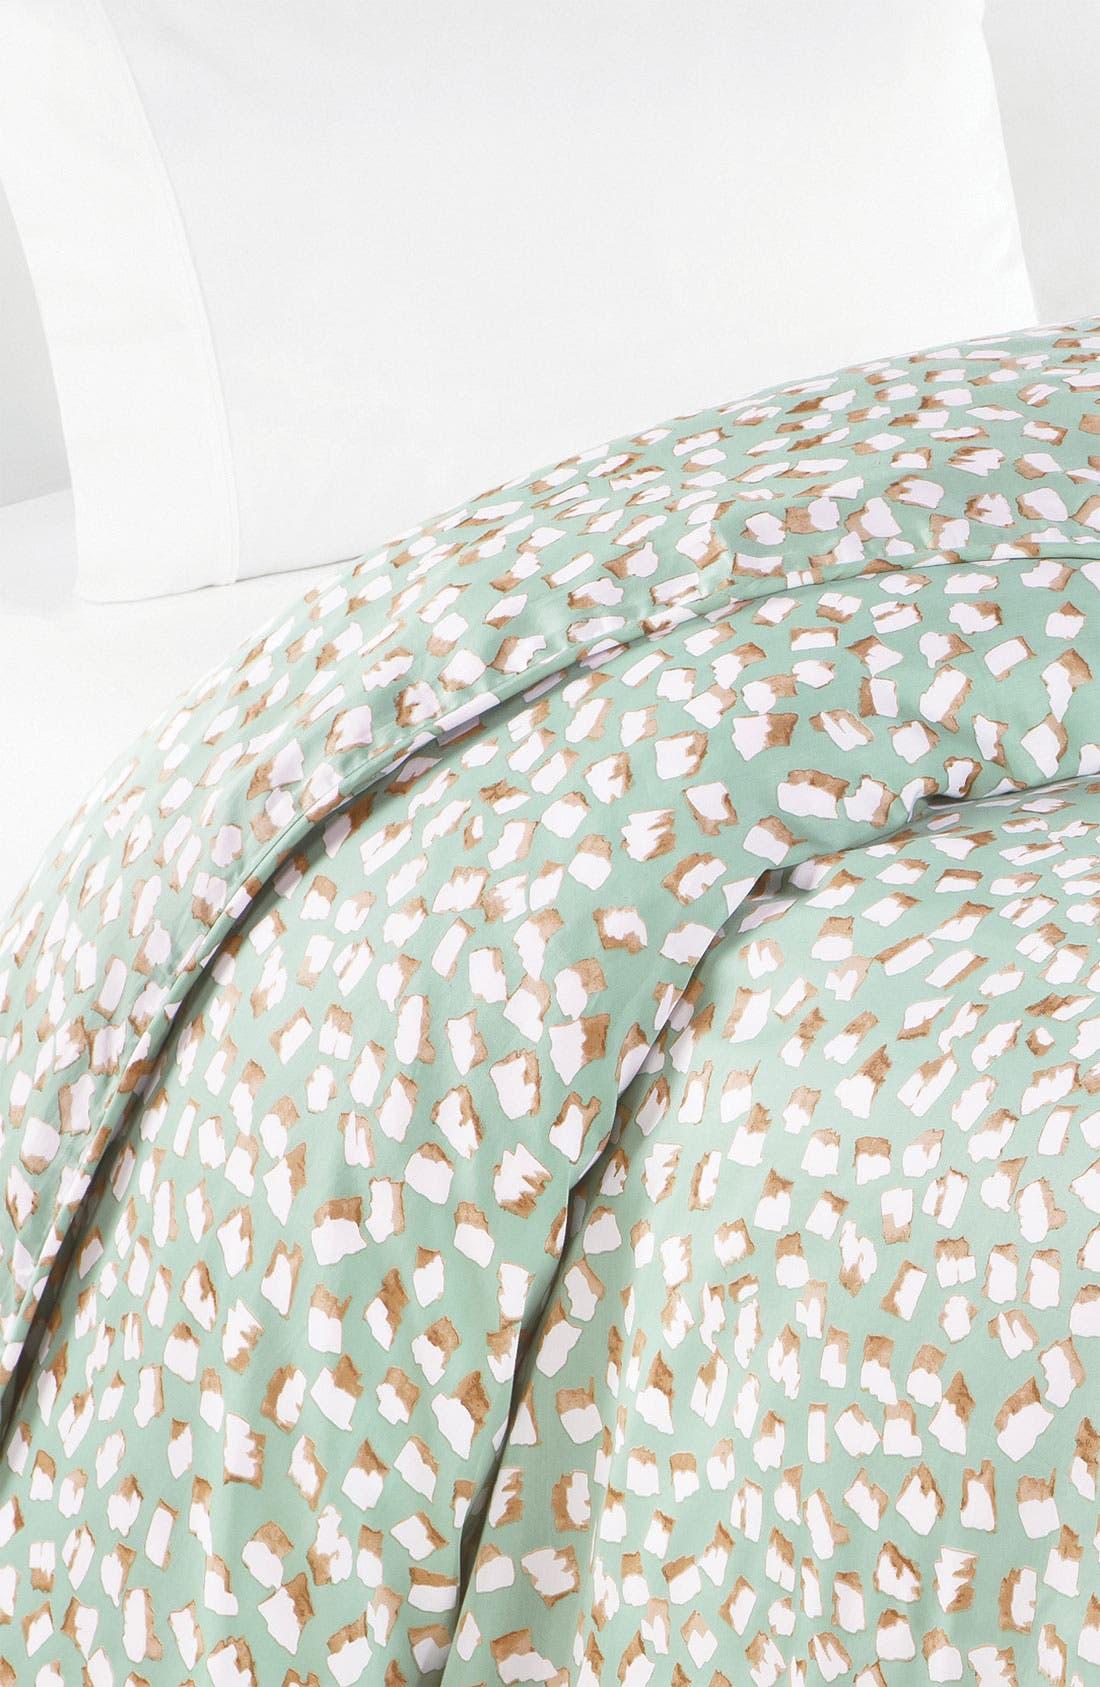 Main Image - Diane von Furstenberg 'Pomme Sky' 300 Thread Count Duvet Cover